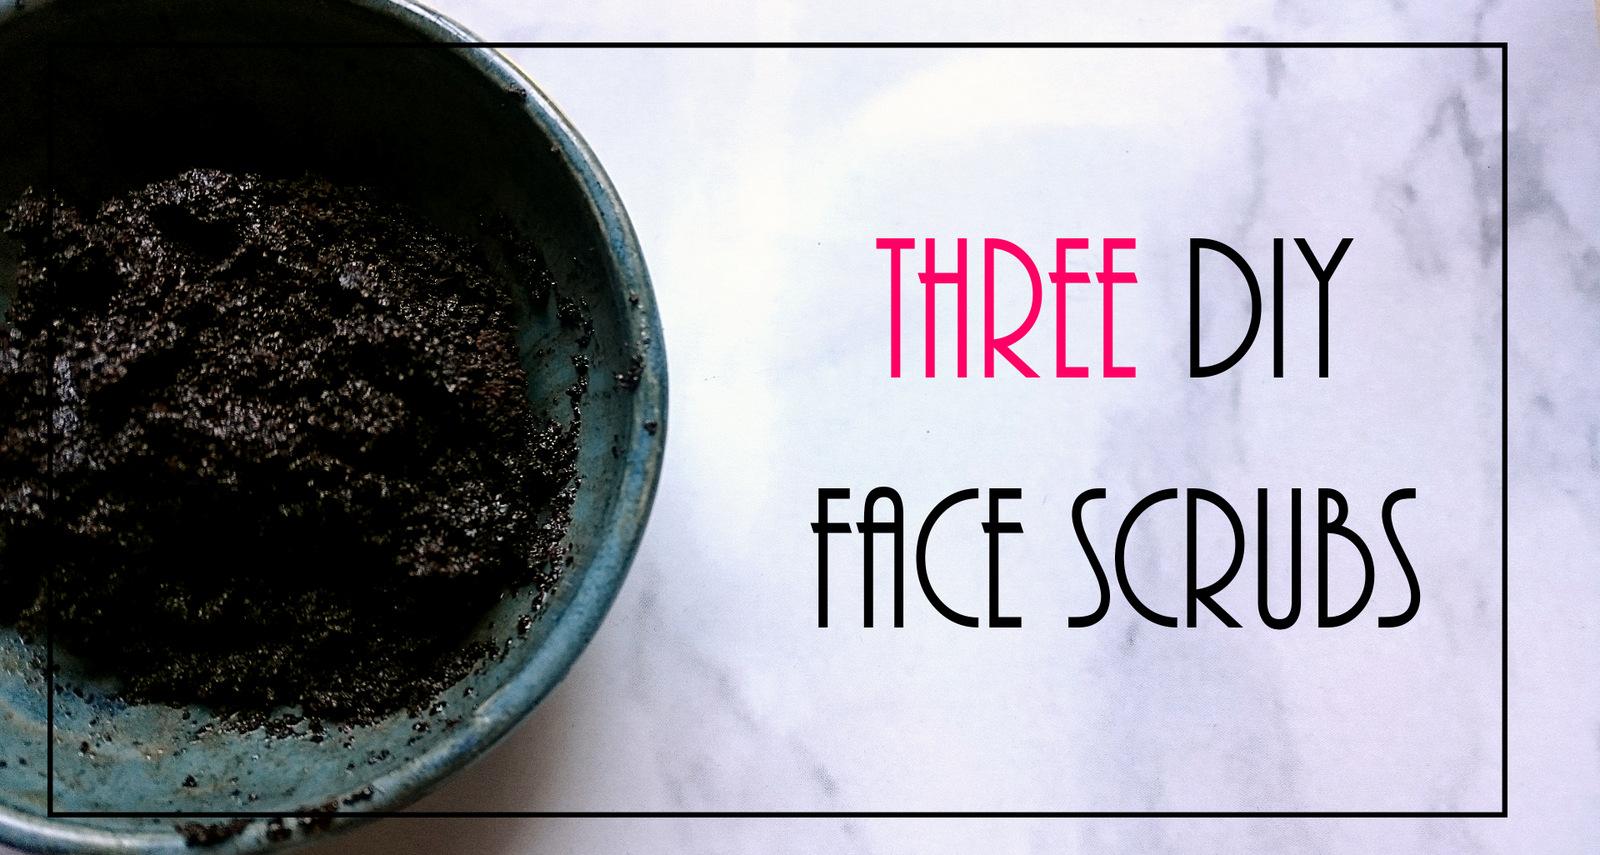 three diy face scrubs